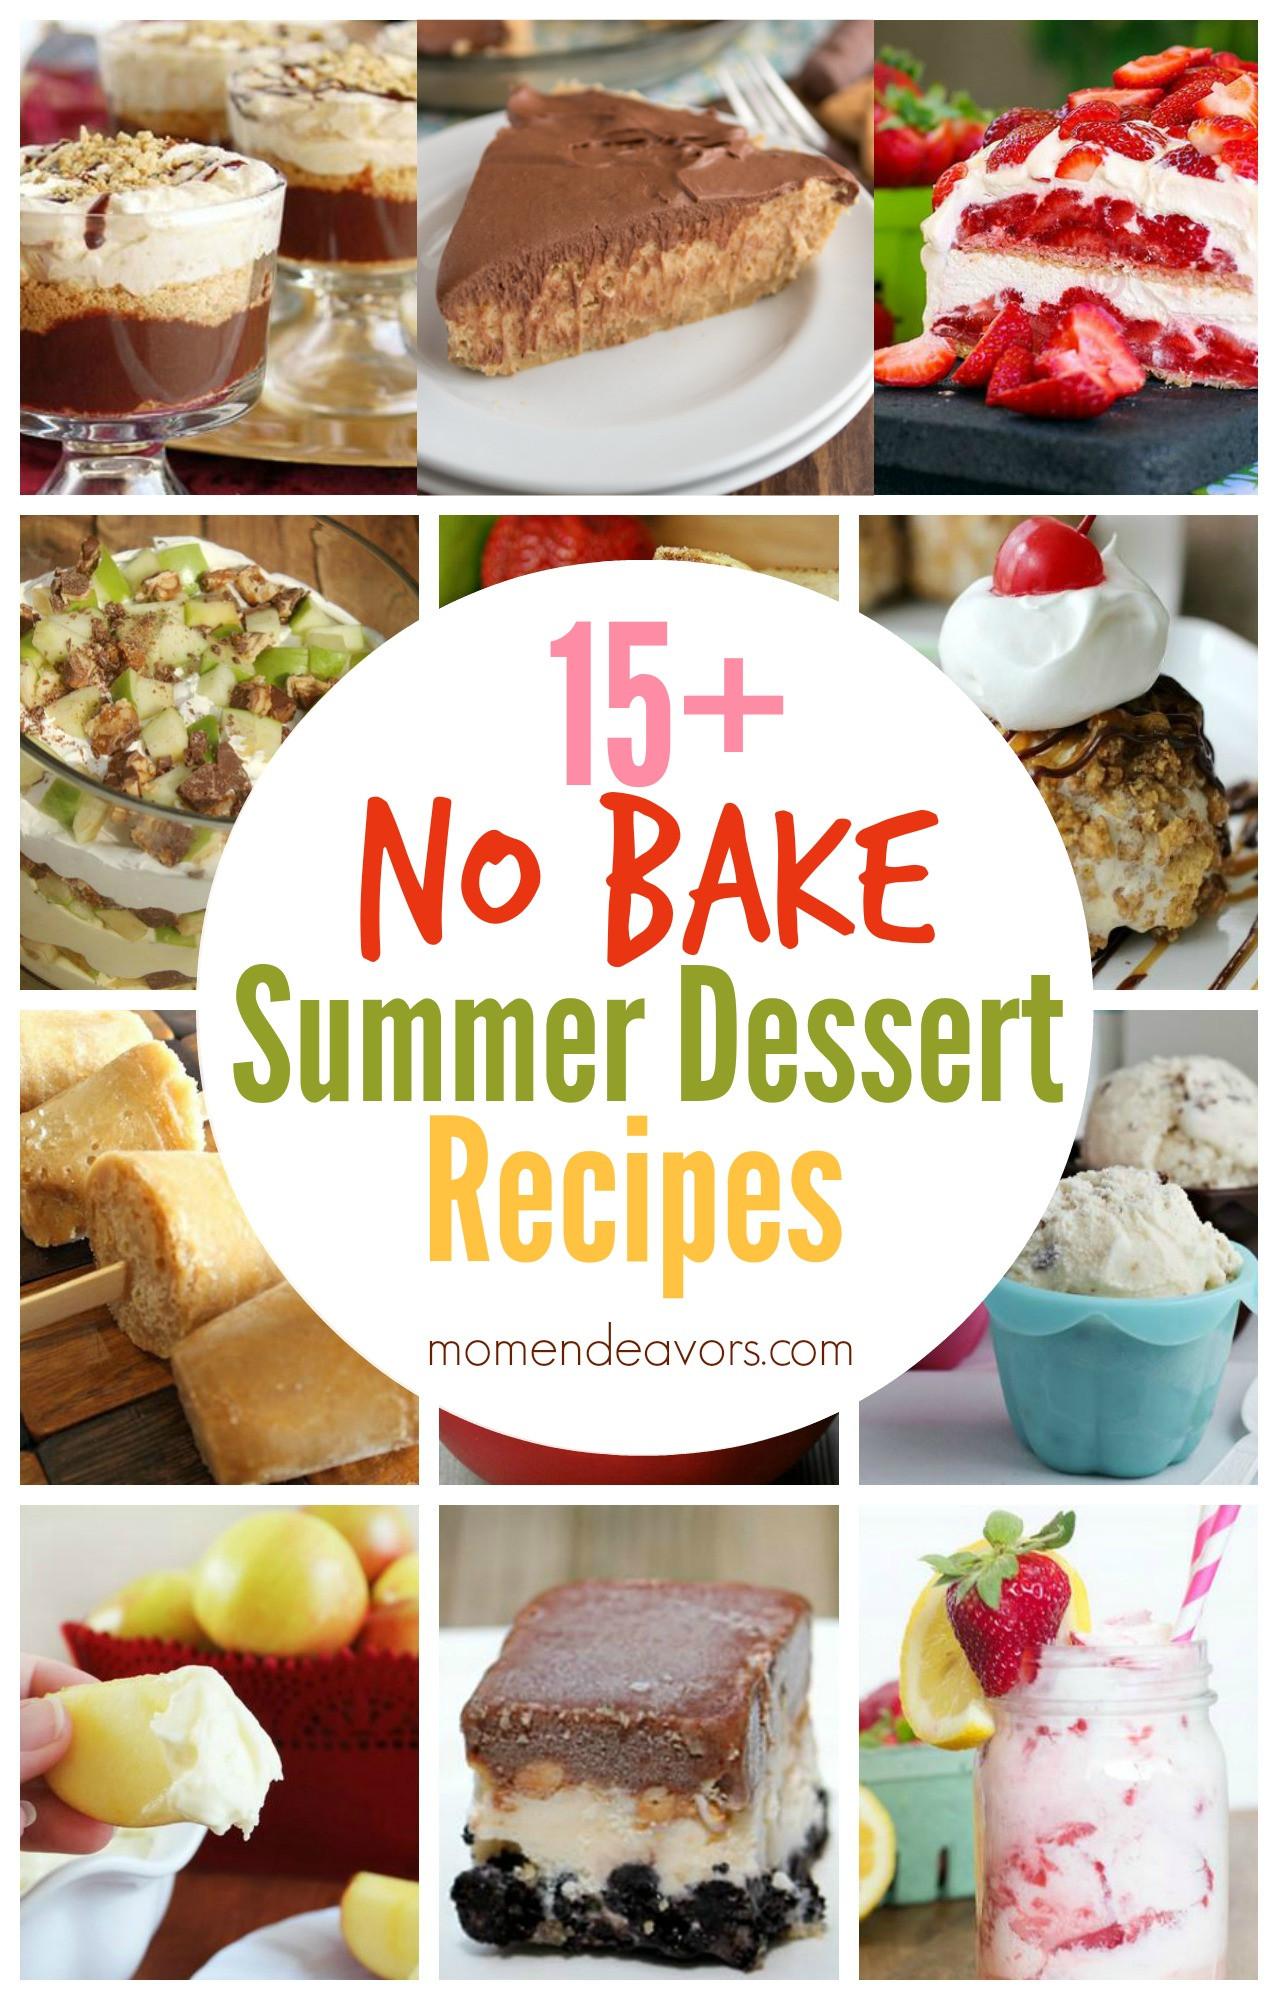 No Bake Desserts For Summer  15 No Bake Summer Dessert Recipes